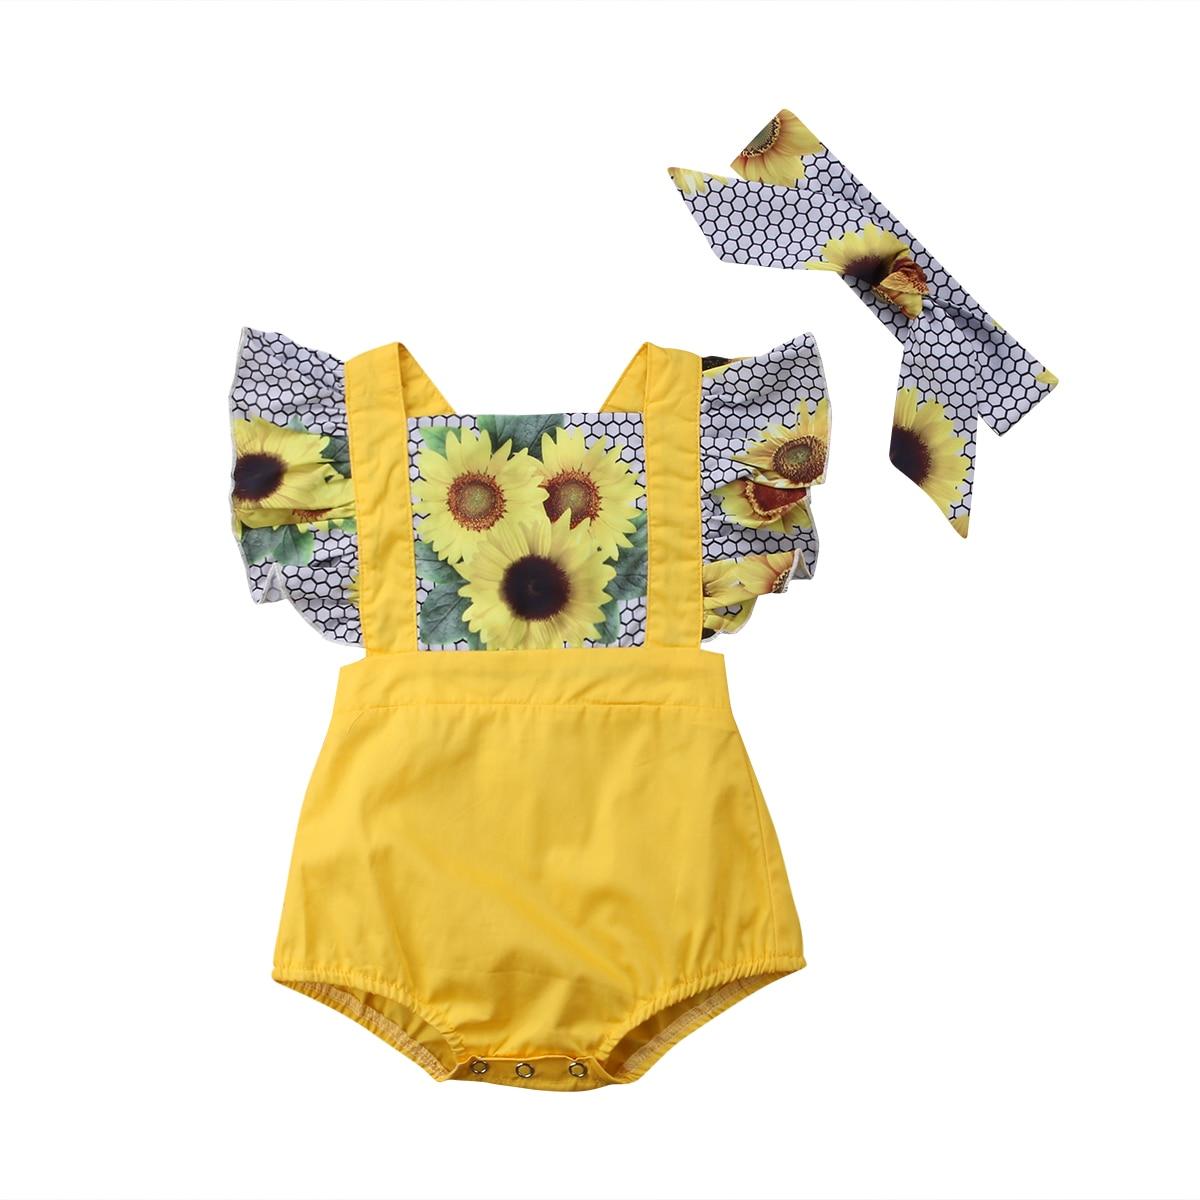 2018 sommer Neugeborenen Kinder Baby Mädchen Sunflower Body Overall Sunsuit Outfits Größe 0-24 M